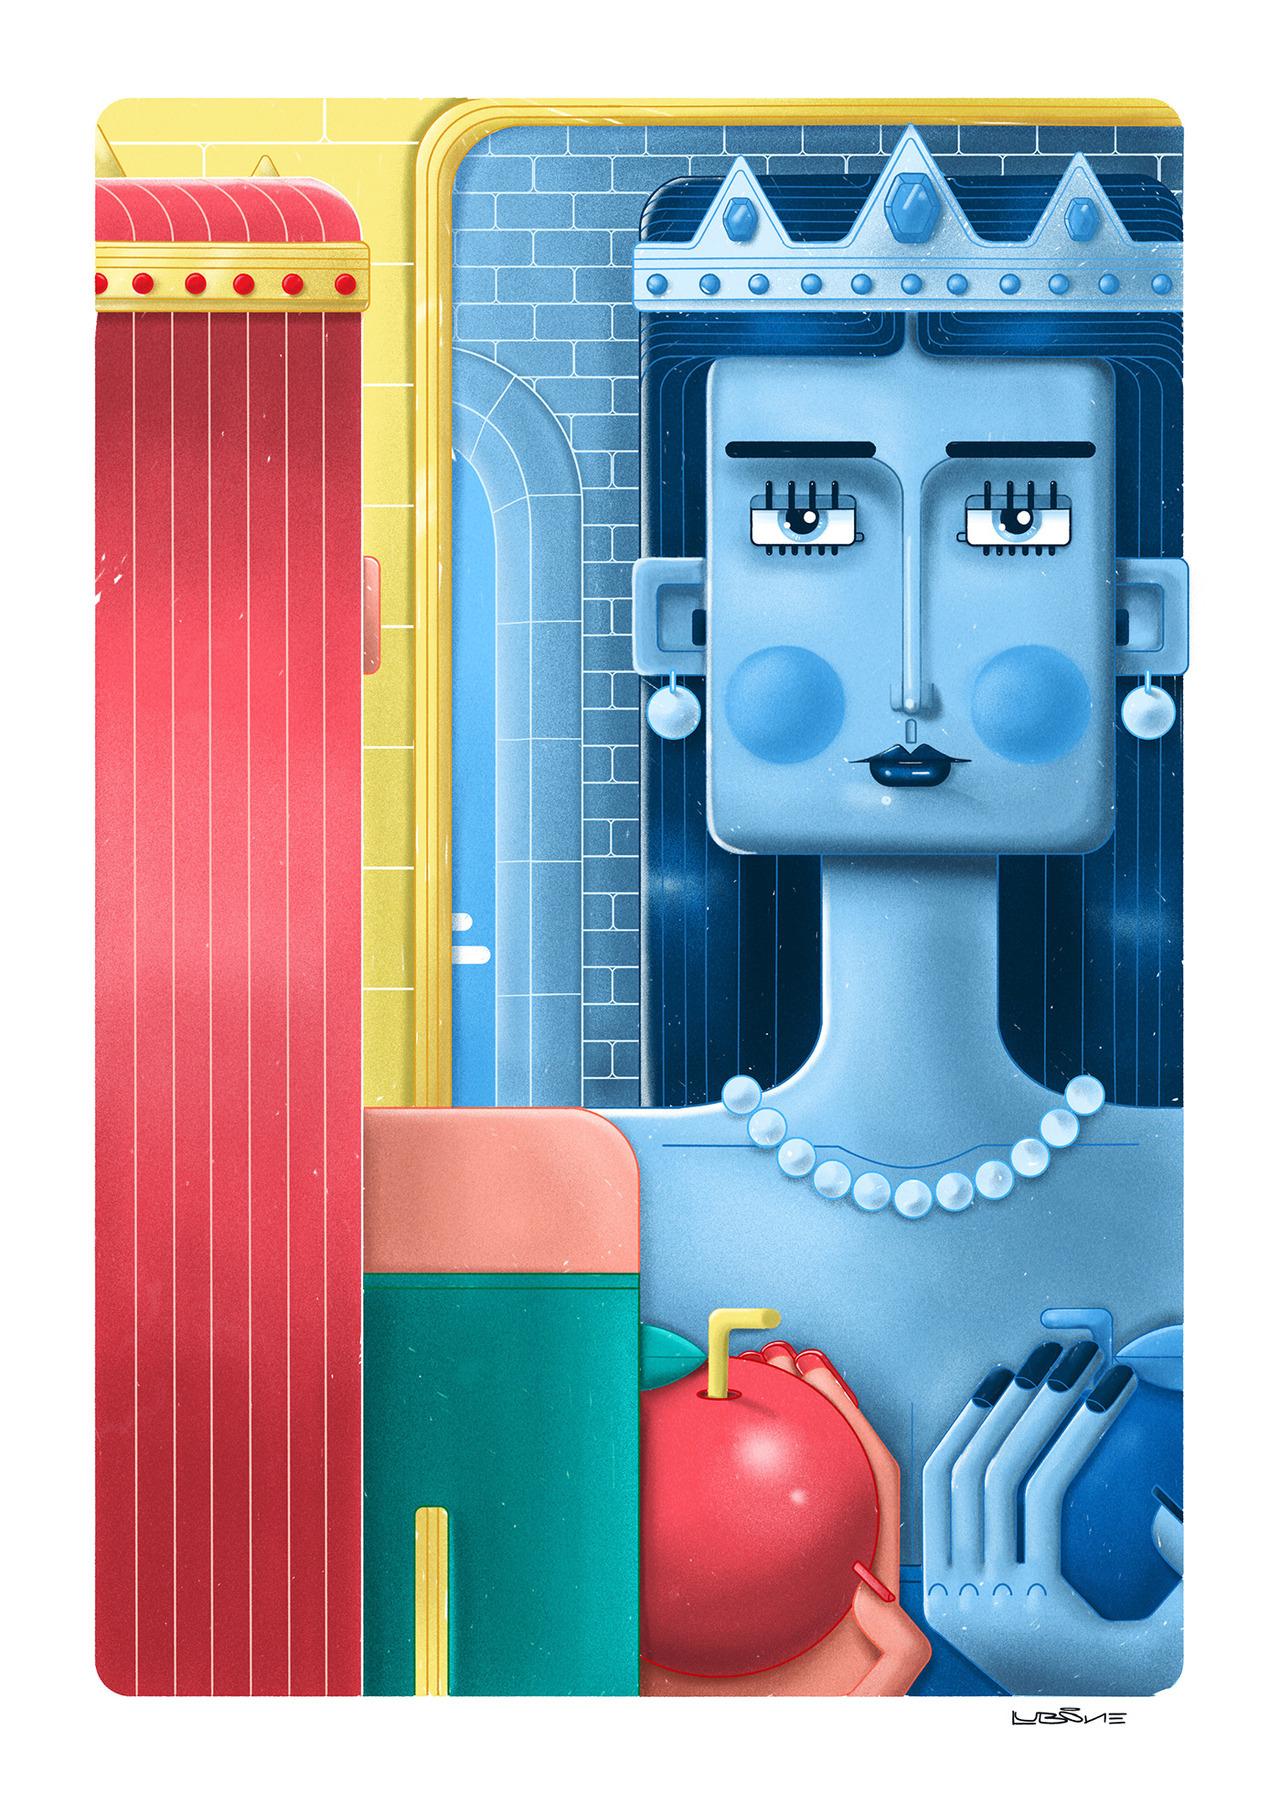 Lub One Иллюстрация, Цифровое искусство, Дизайн персонажей (11).jpg